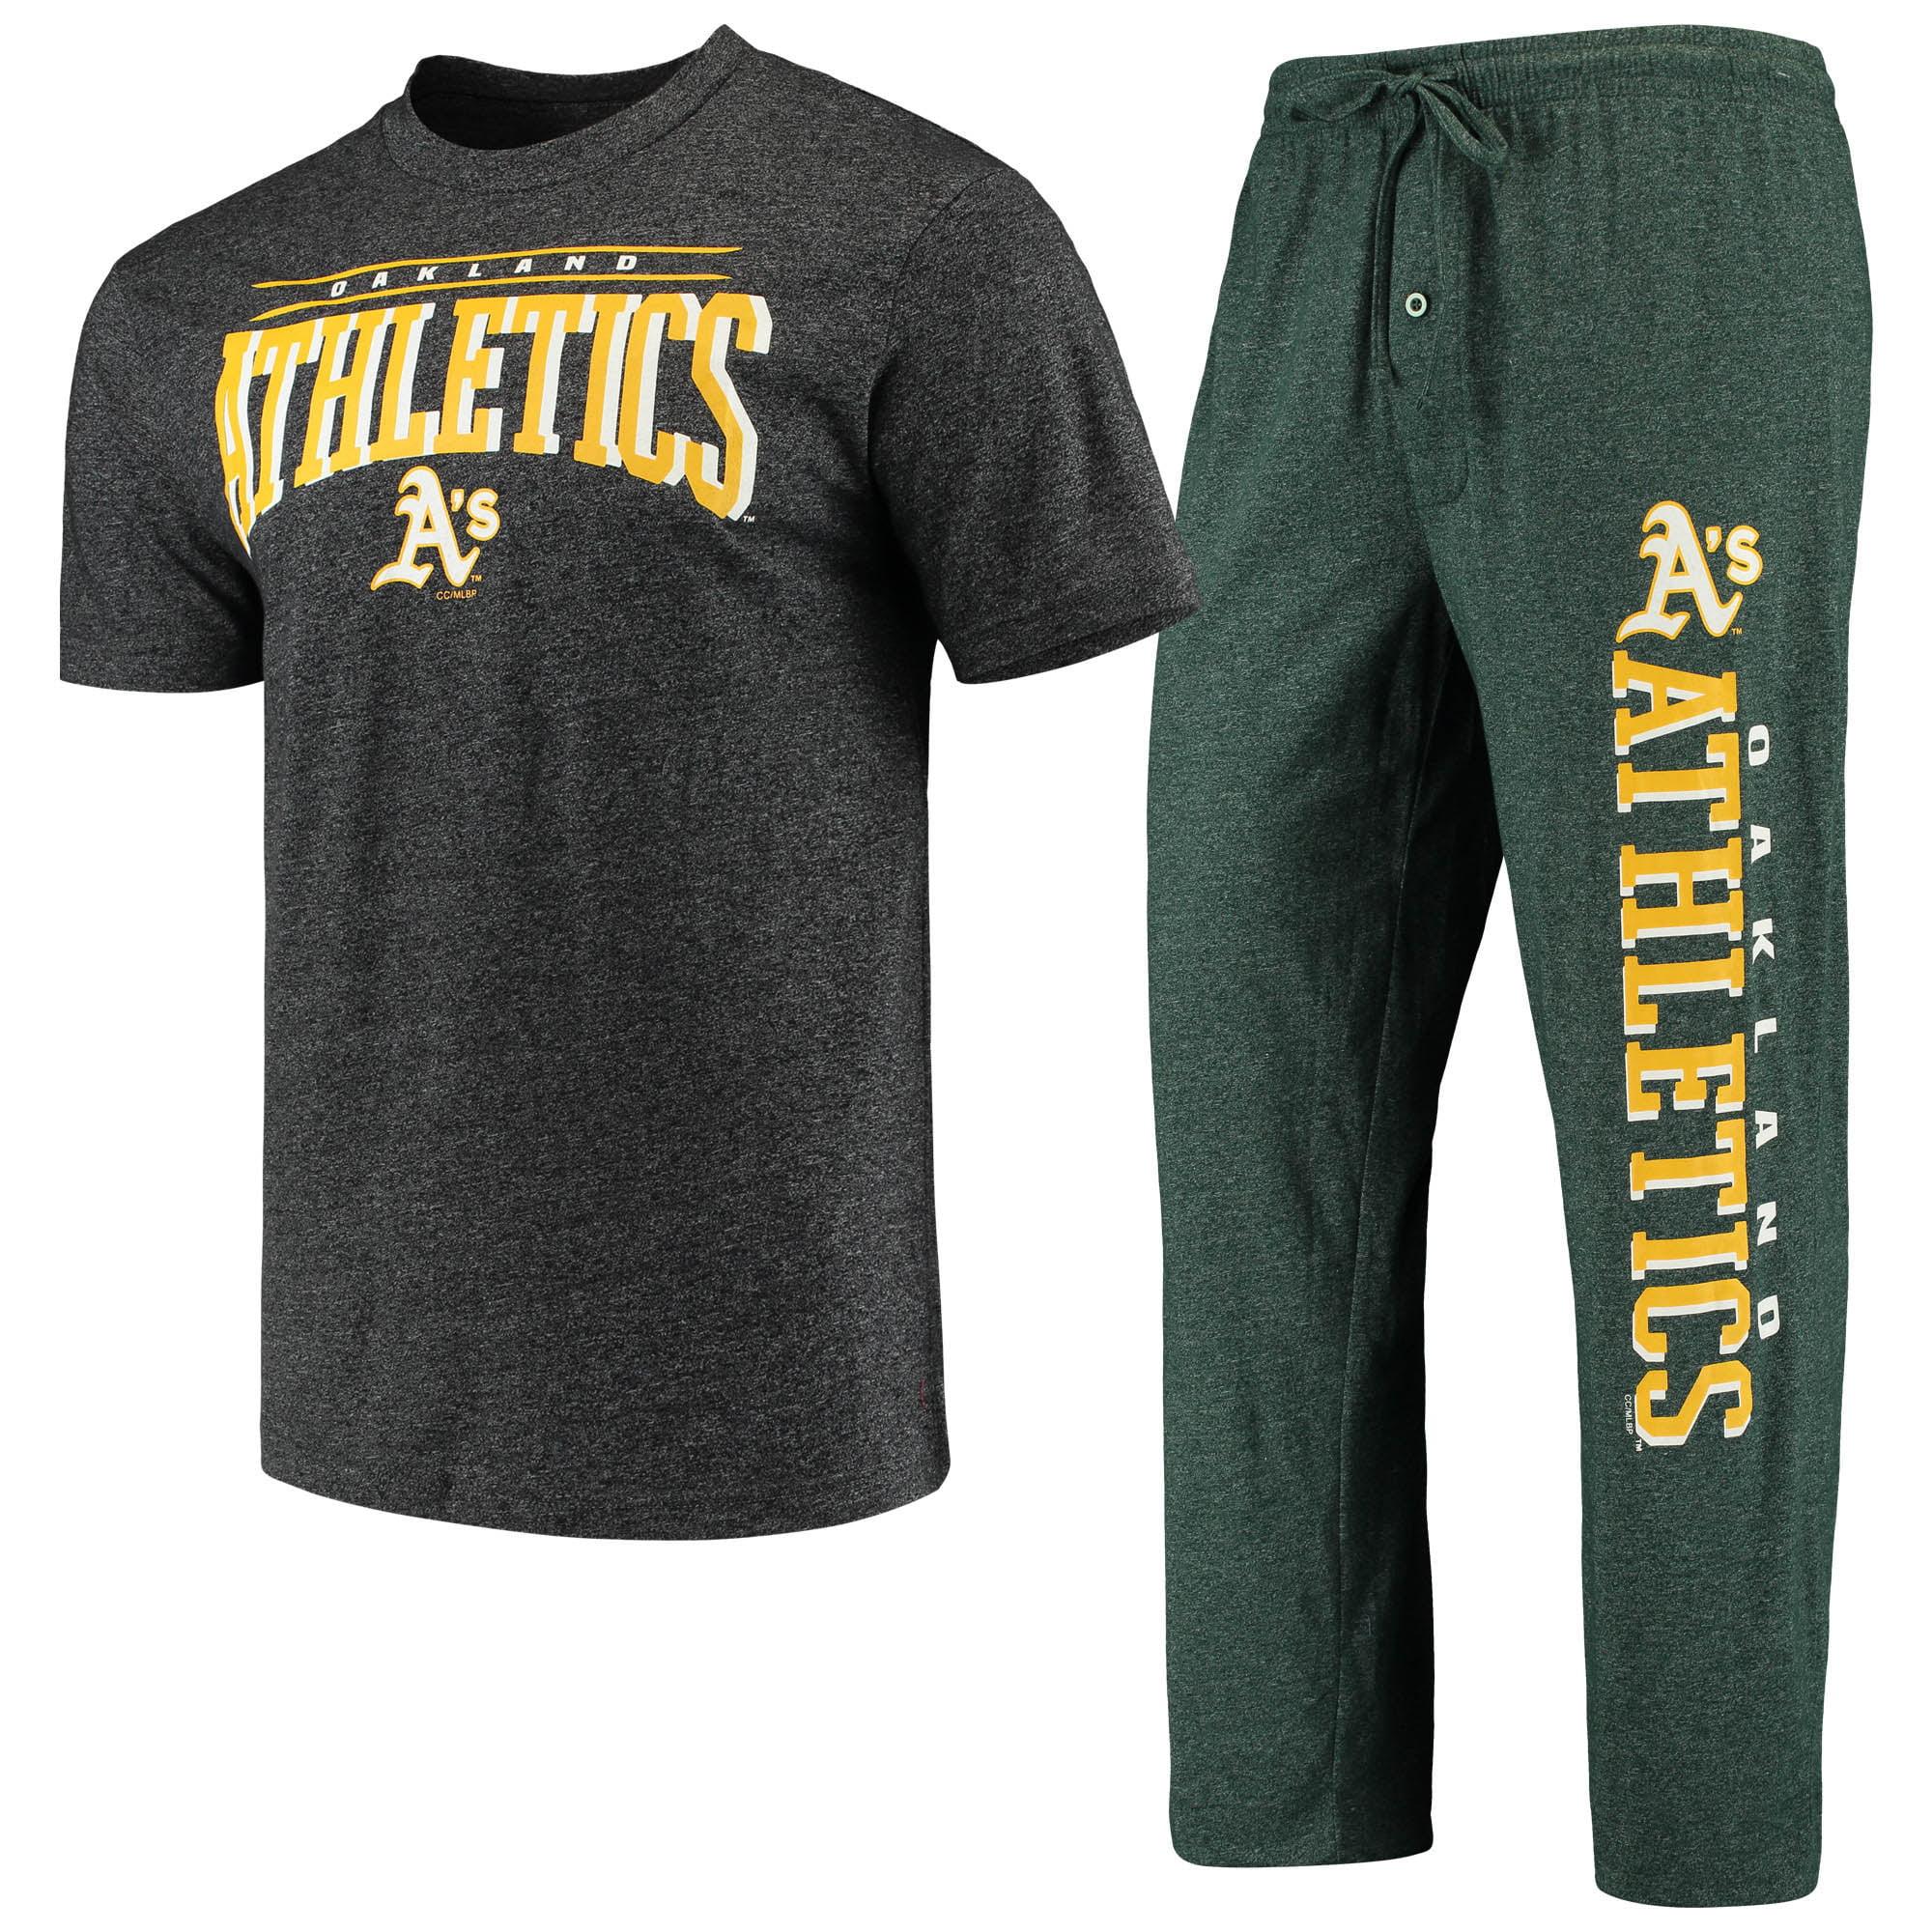 Oakland Athletics Concepts Sport Holiday Pants & Top Sleep Set - Heathered Green/Heathered Charcoal